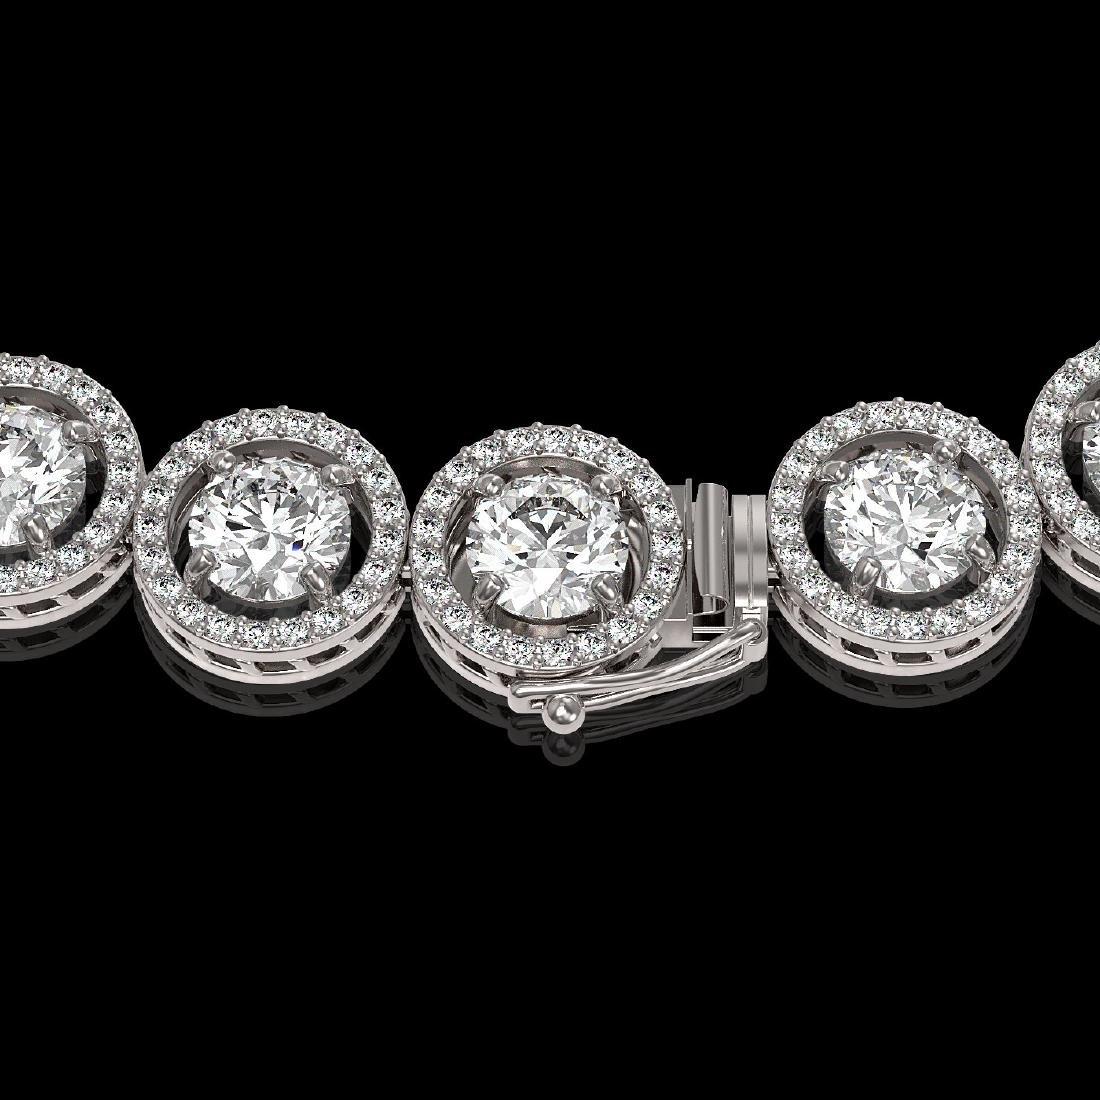 30.78 CTW Diamond Designer Necklace 18K White Gold - 3